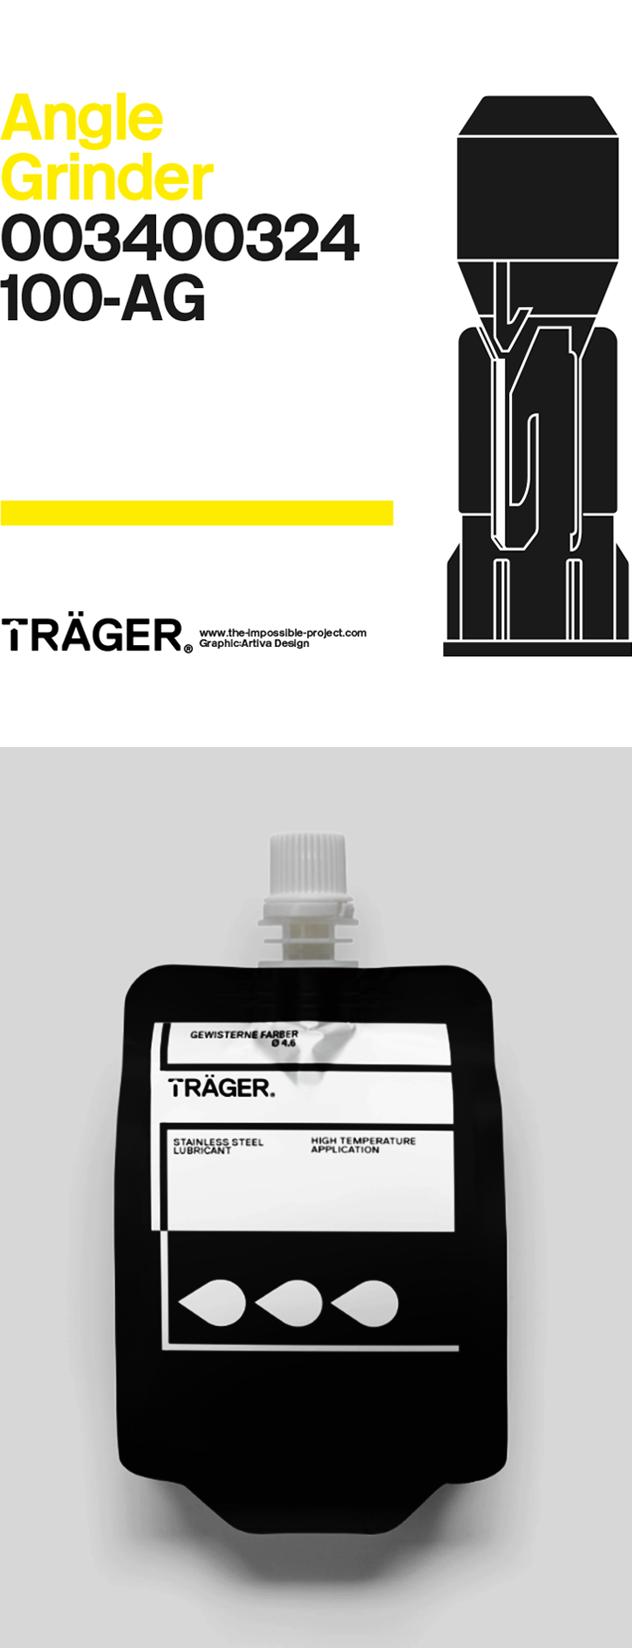 Minimalist Brand Typography